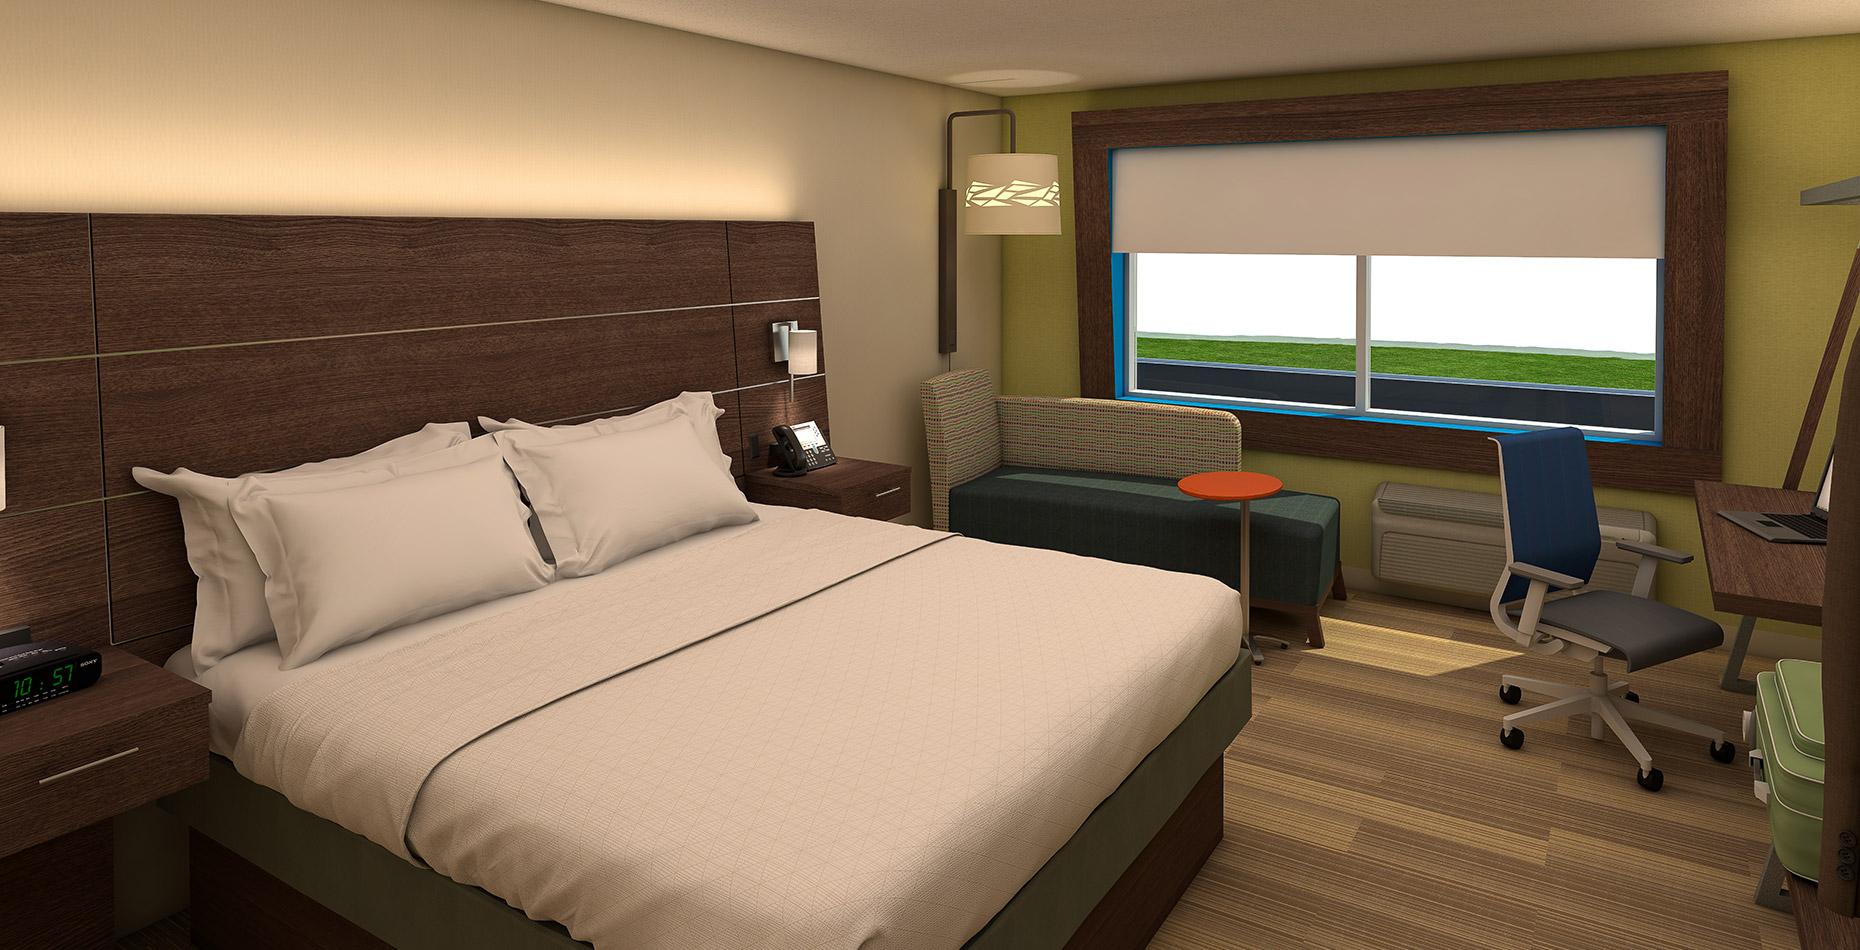 Guest Room 2 Formula Blue Srd Vendor Pricing